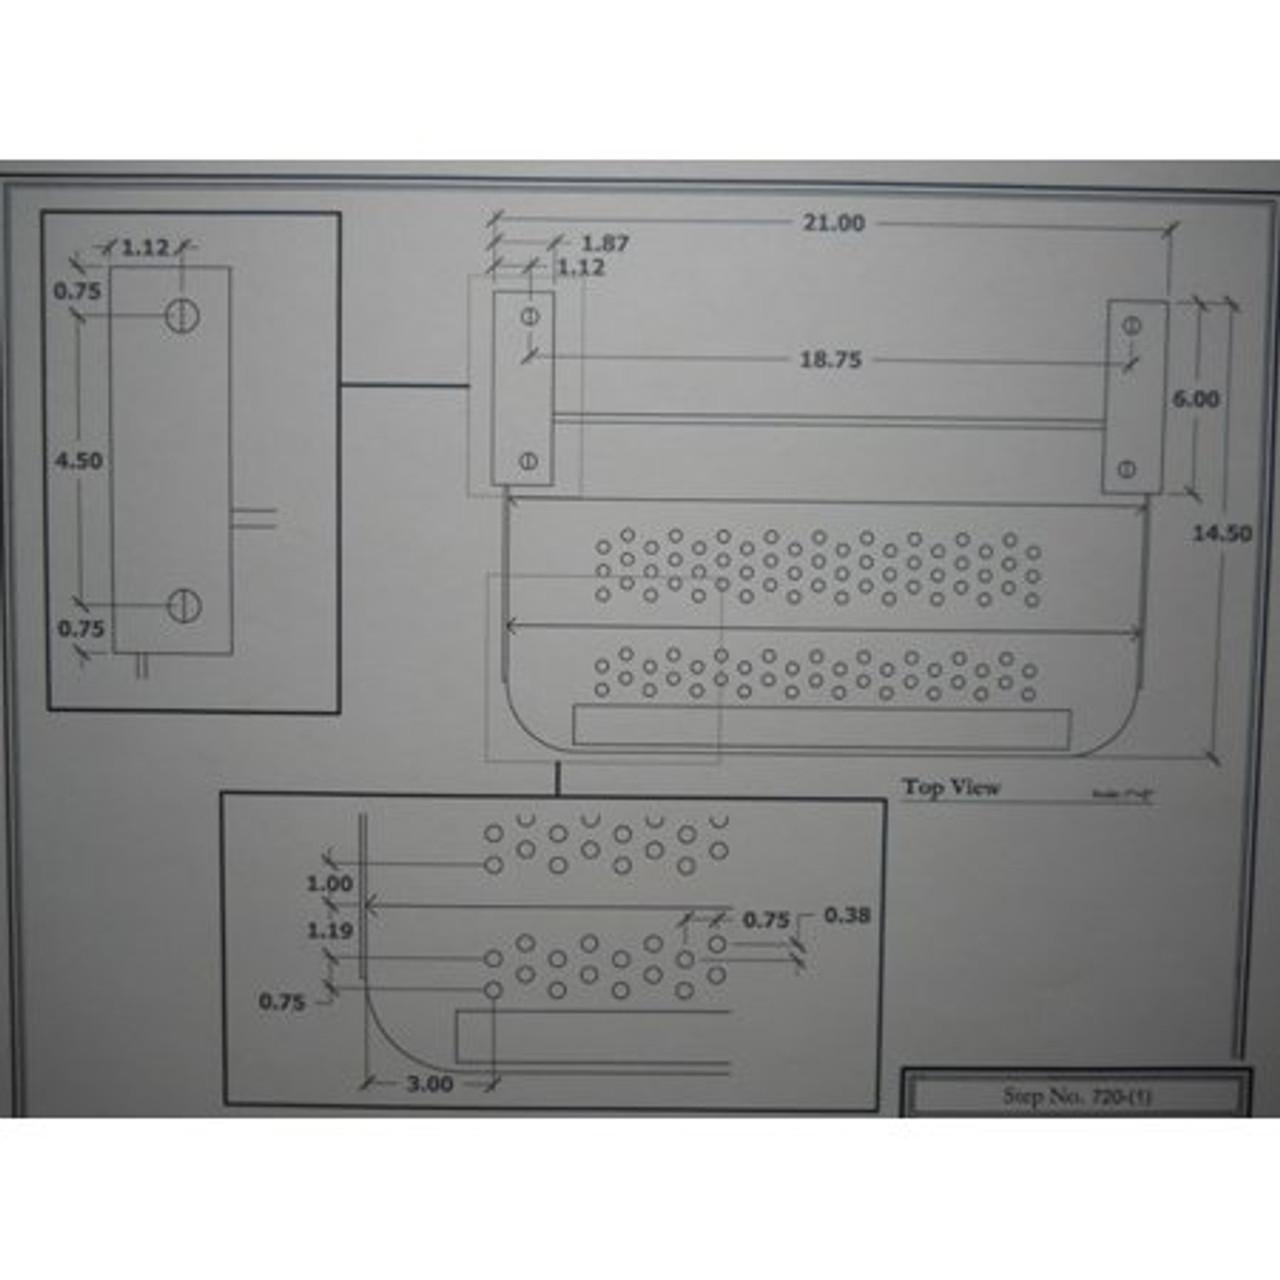 "20"" SINGLE TRAILER STEP - 7"" DROP - (04-1000) DIMENSIONS"